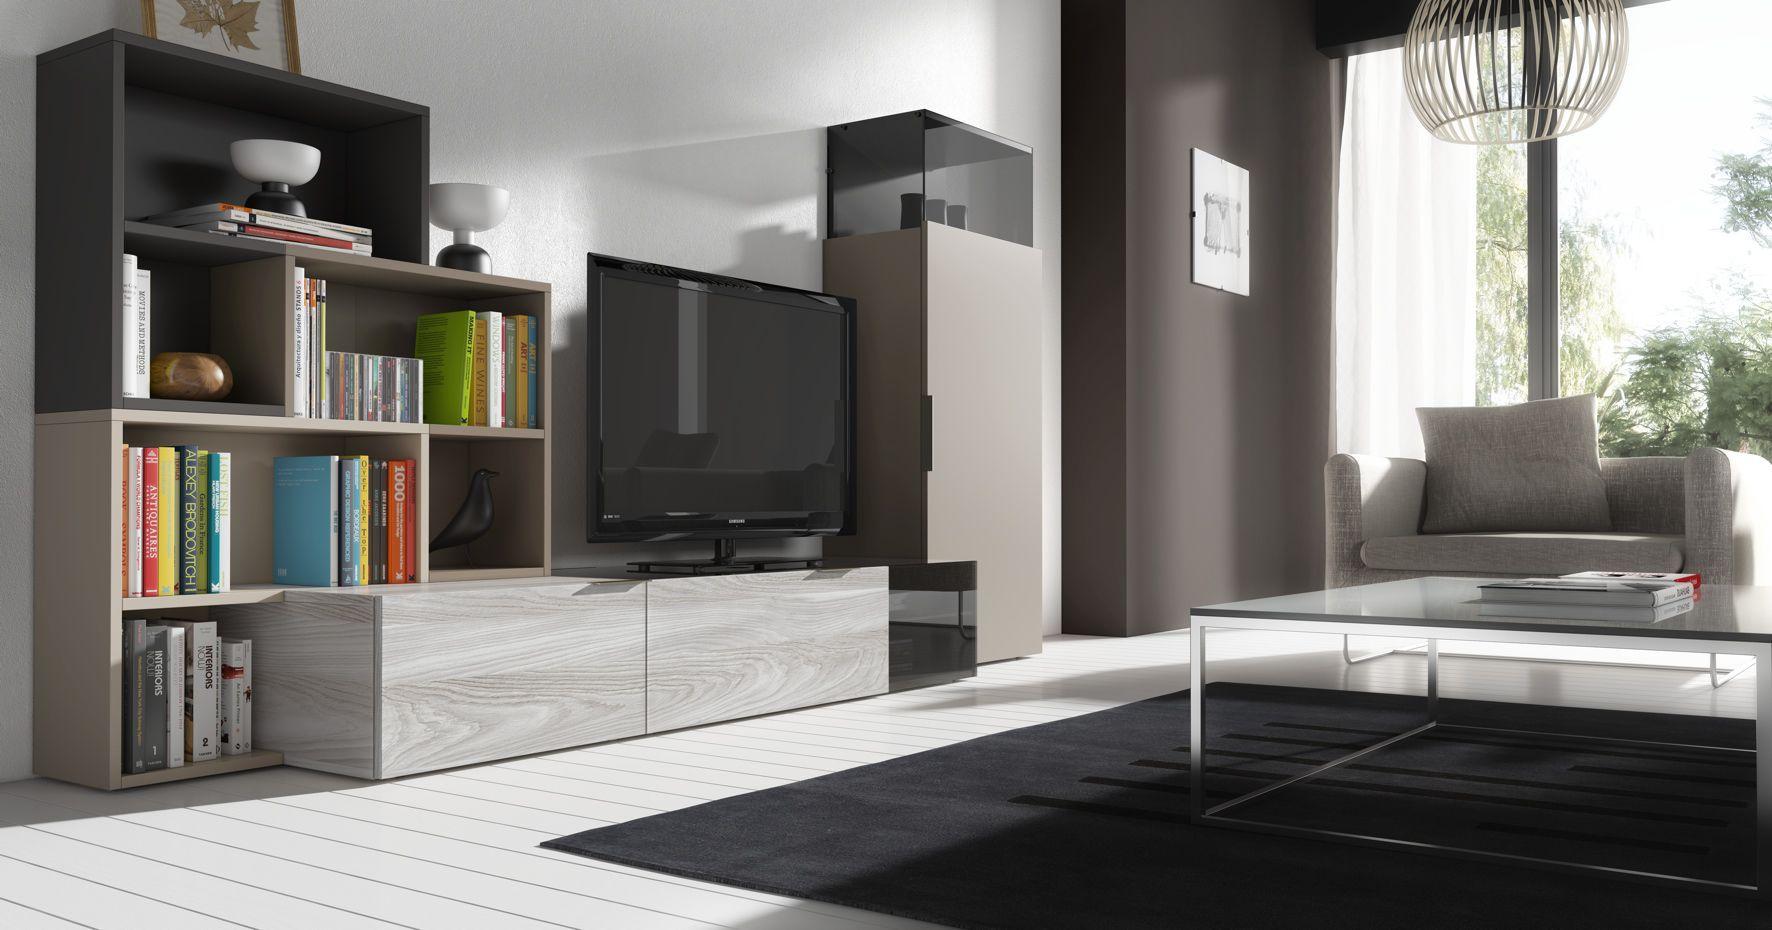 Contemporary Tv Wall Unit Lacquered Wood Iline 4 Piferrer # Muebles Piferrer Iline